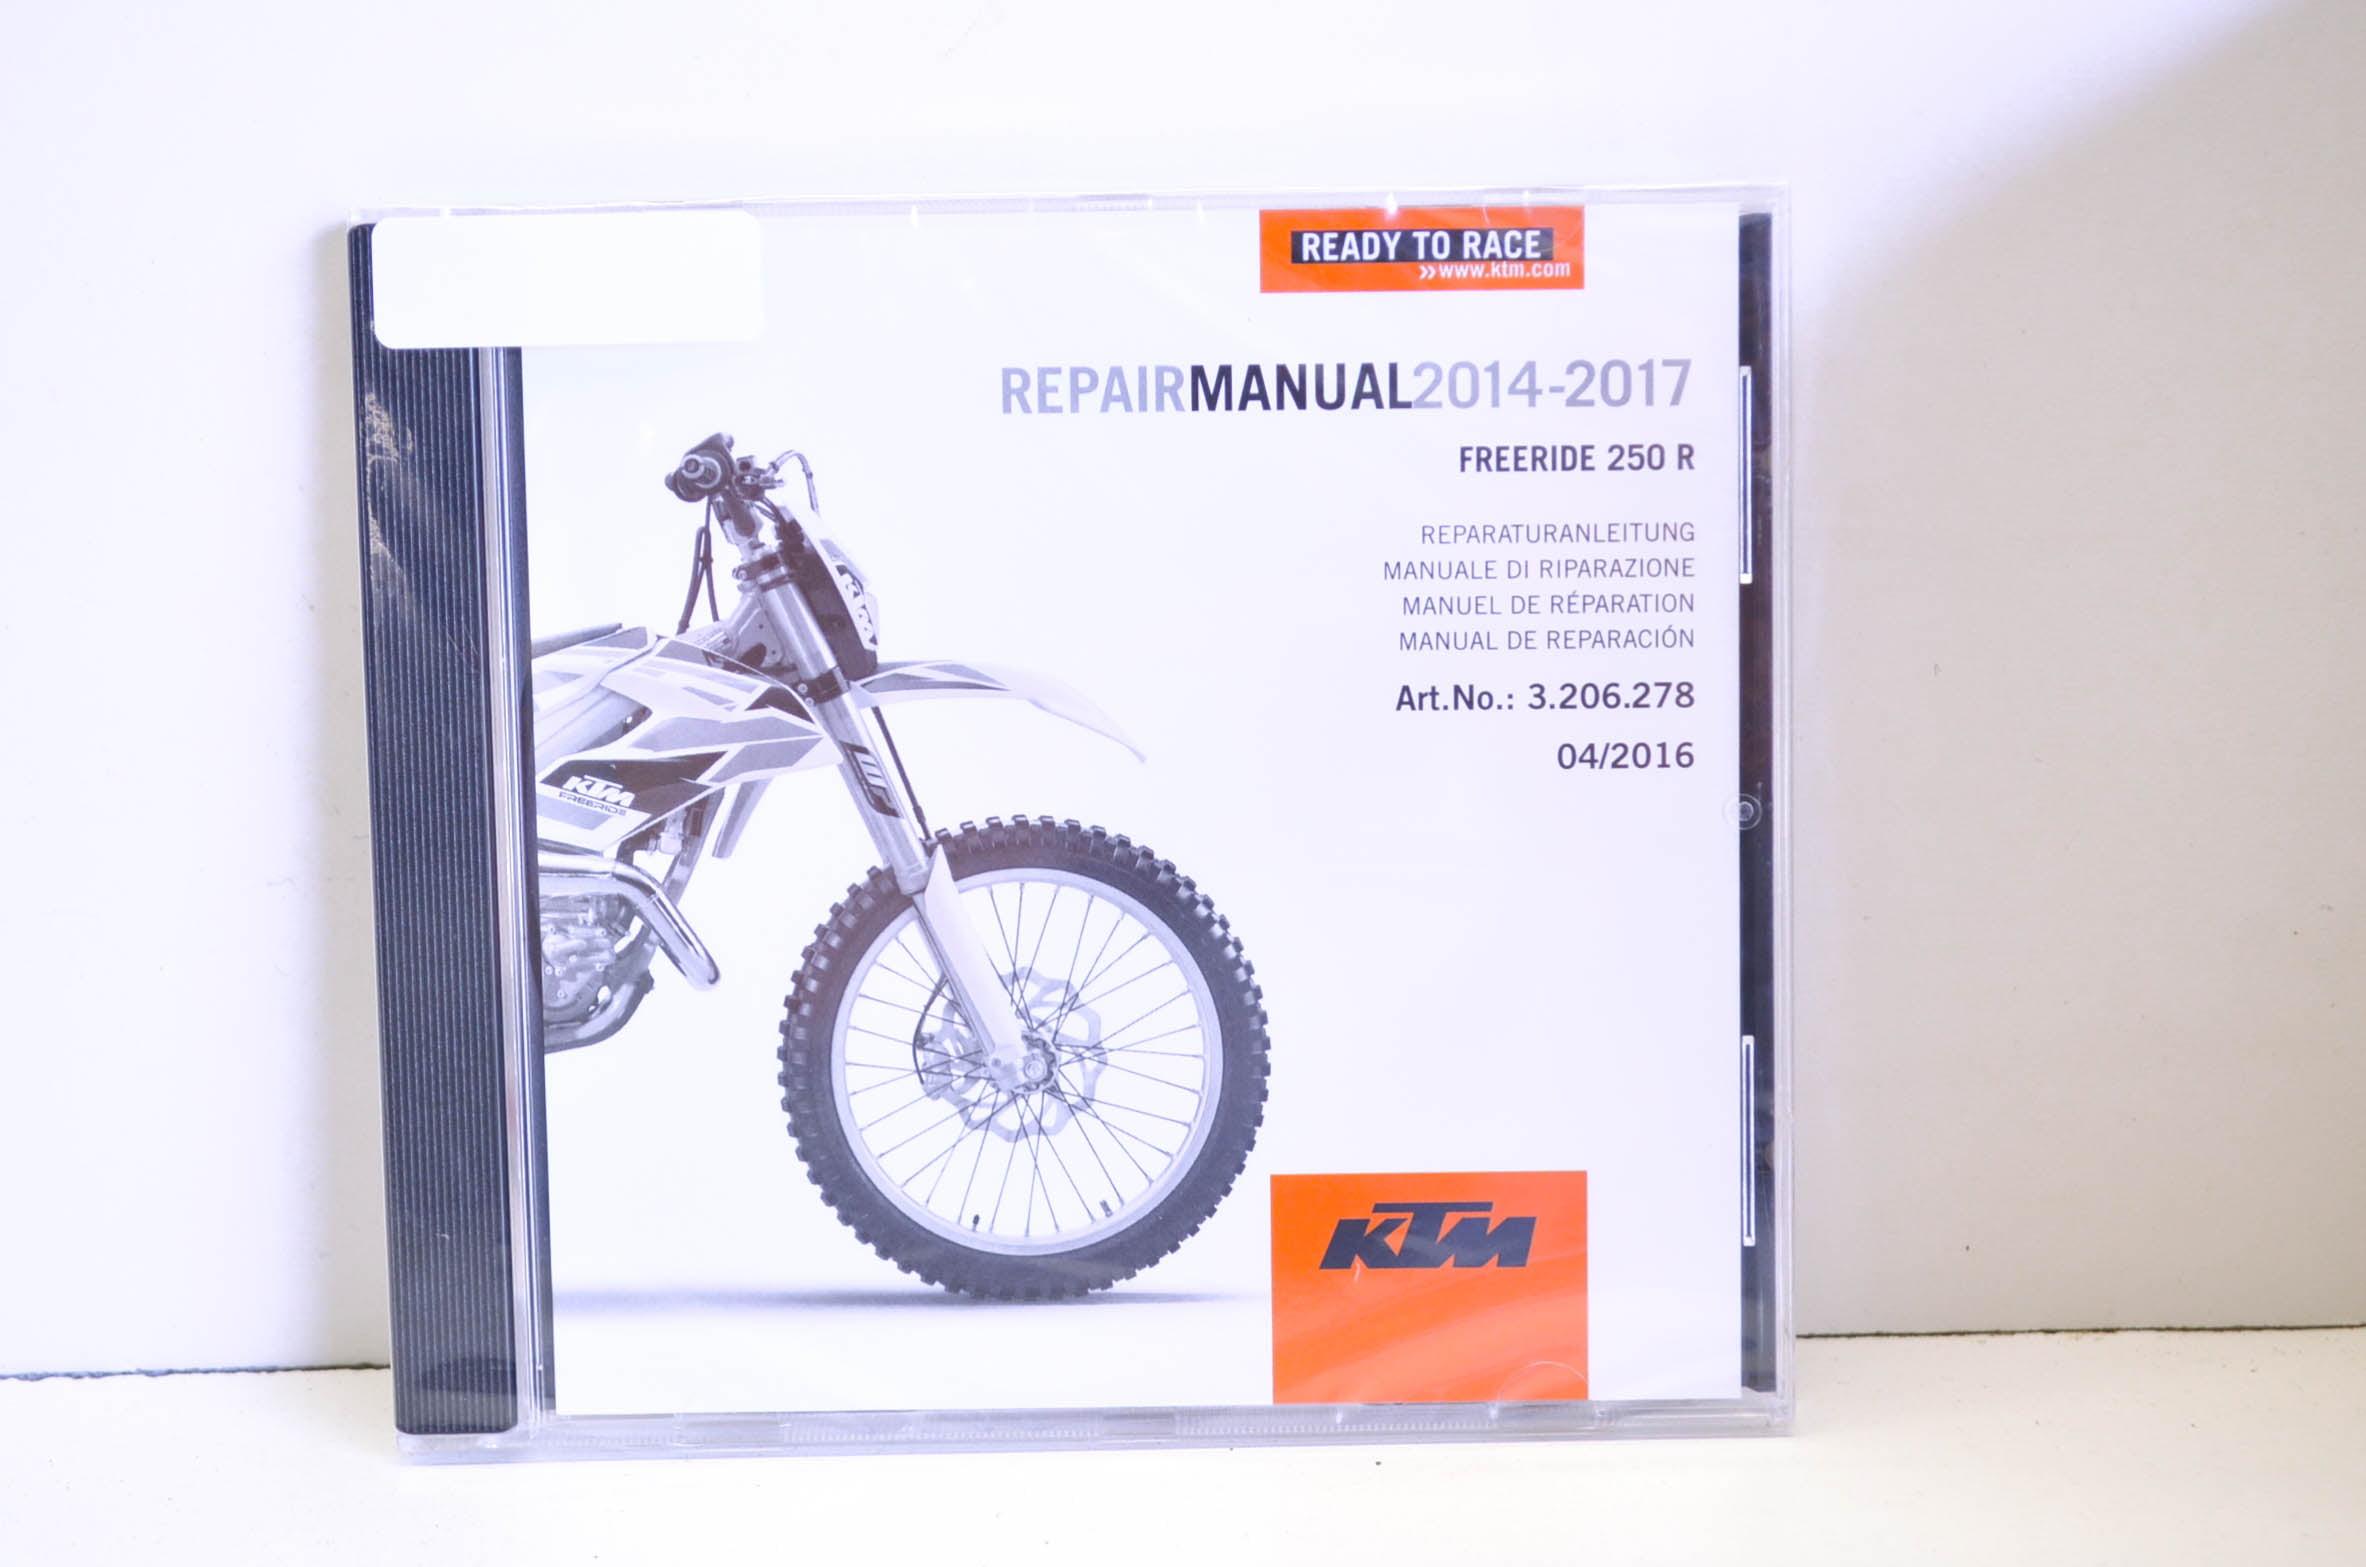 KTM 3206278 2014-2017 Freeride 250 R Repair Manual CD Disc QTY 1 -  Walmart.com